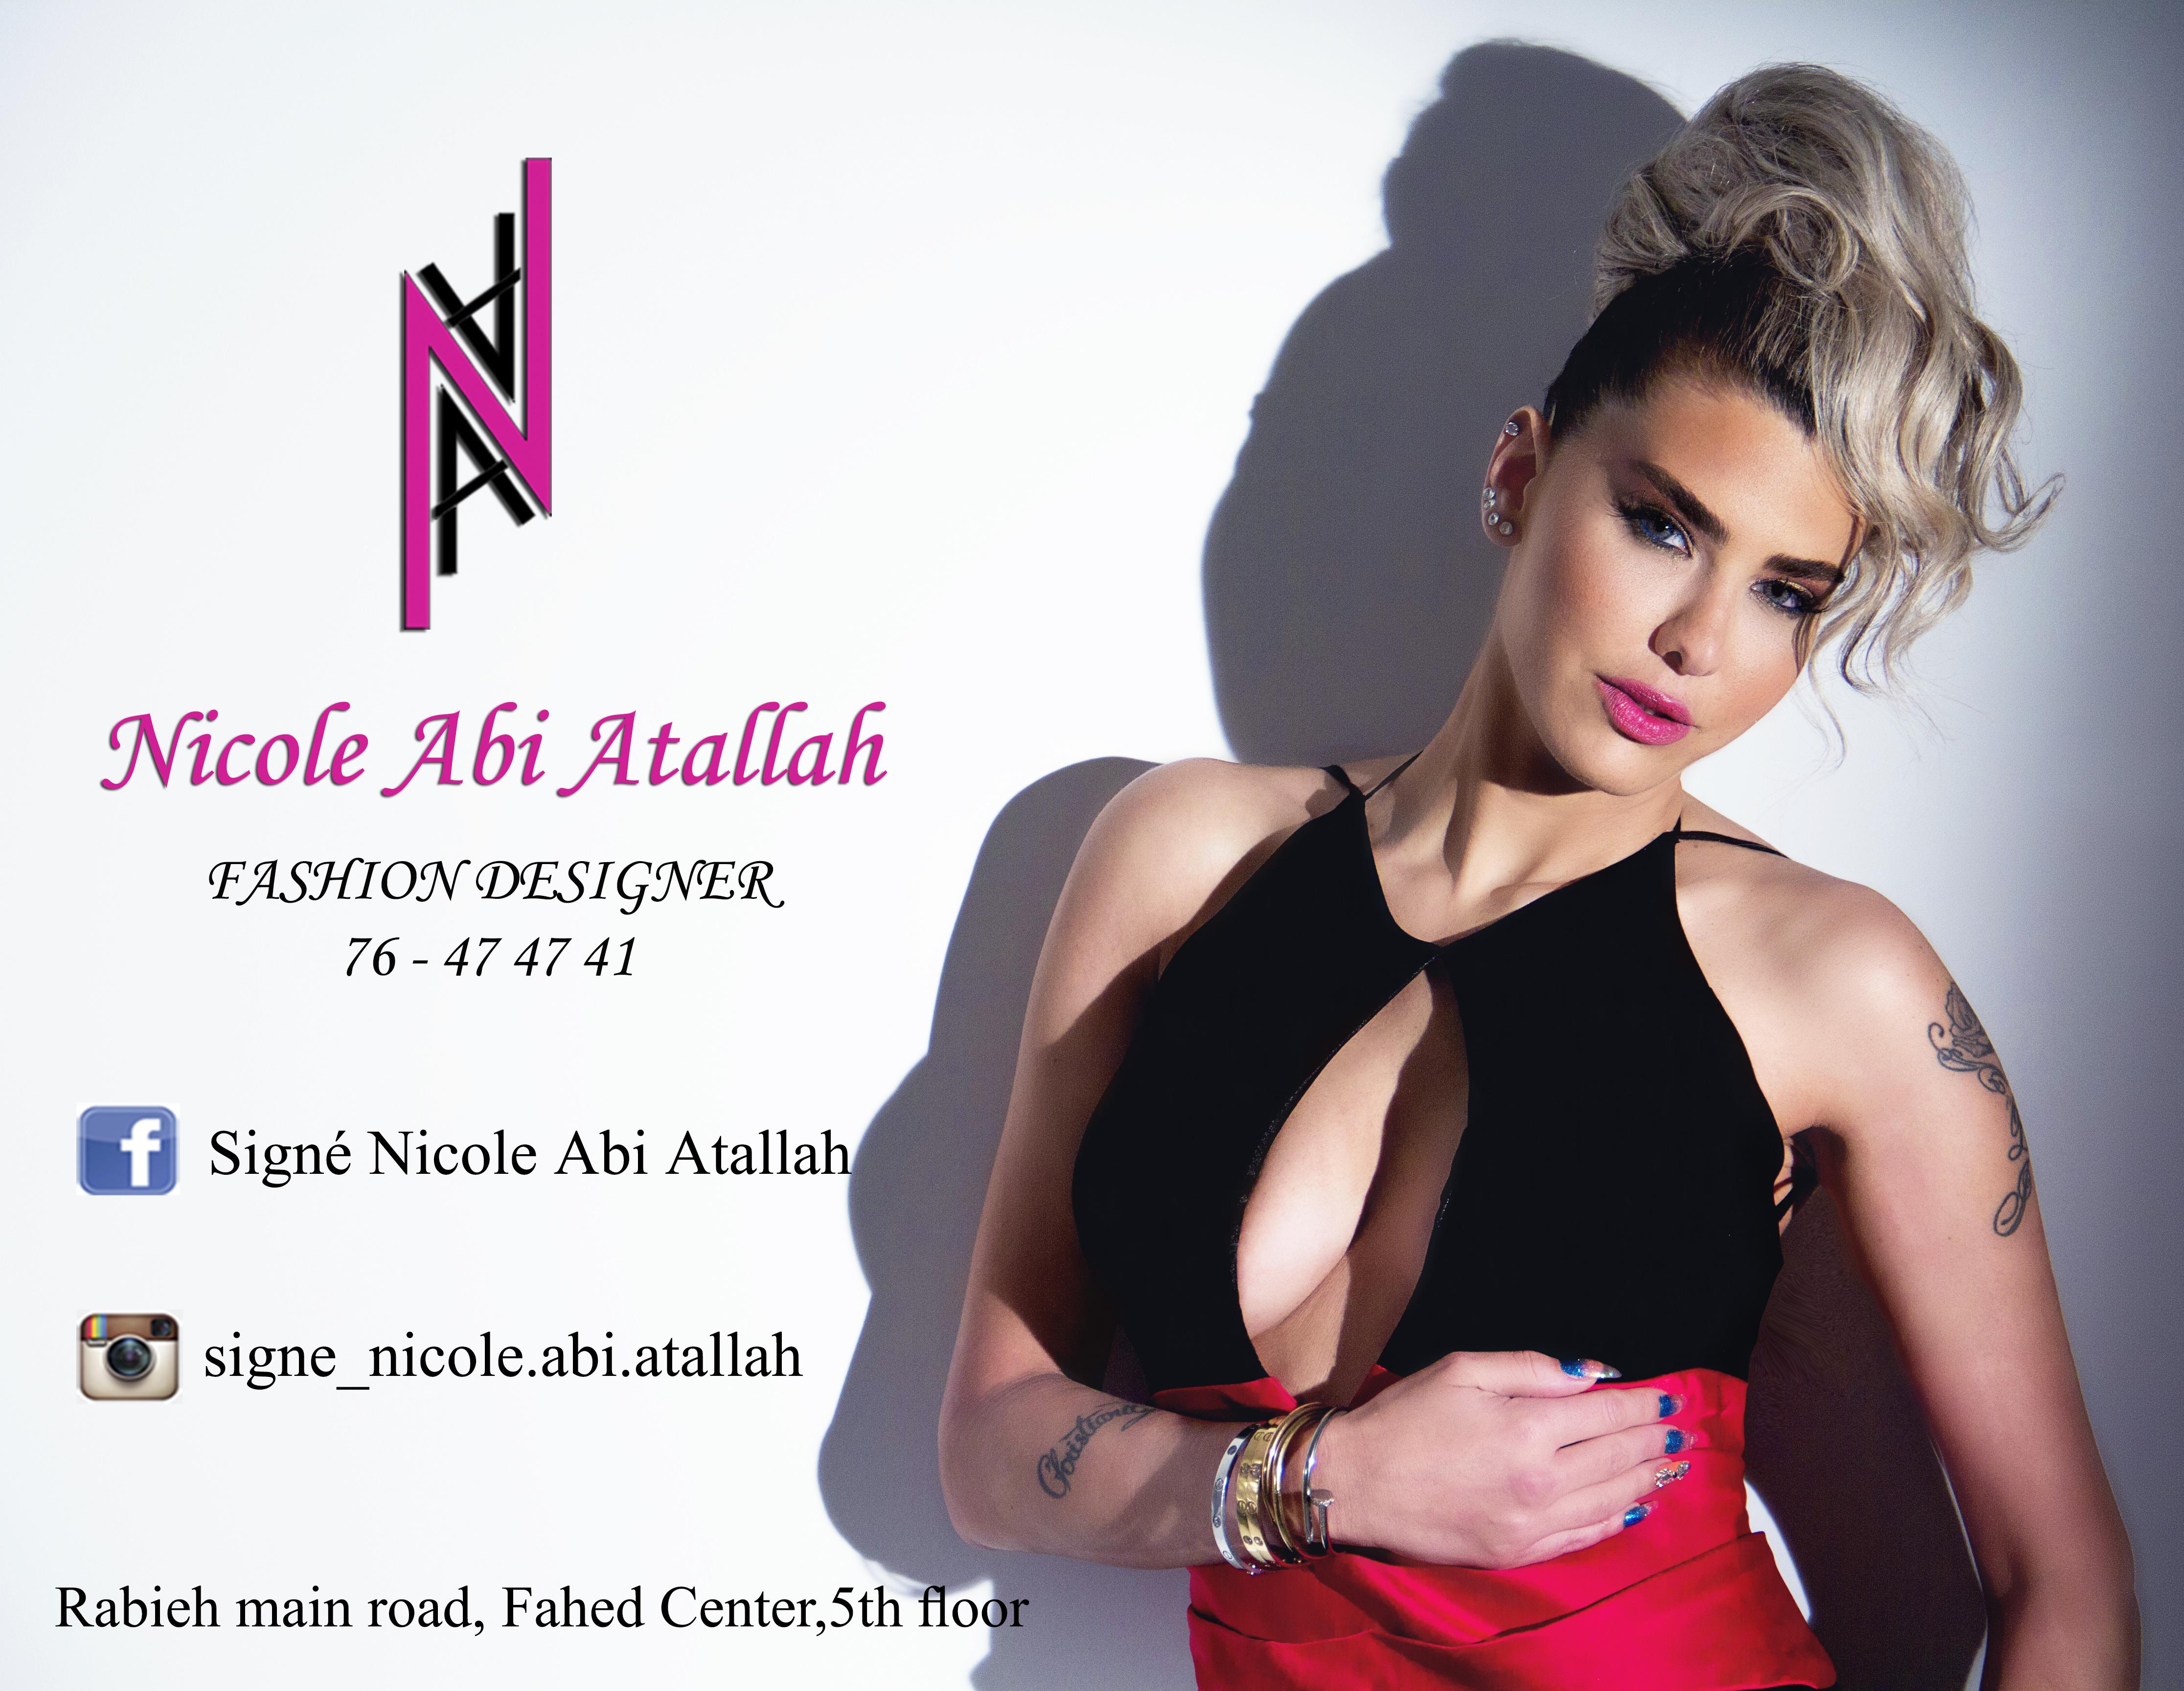 Nicole Abi Atallah Ad